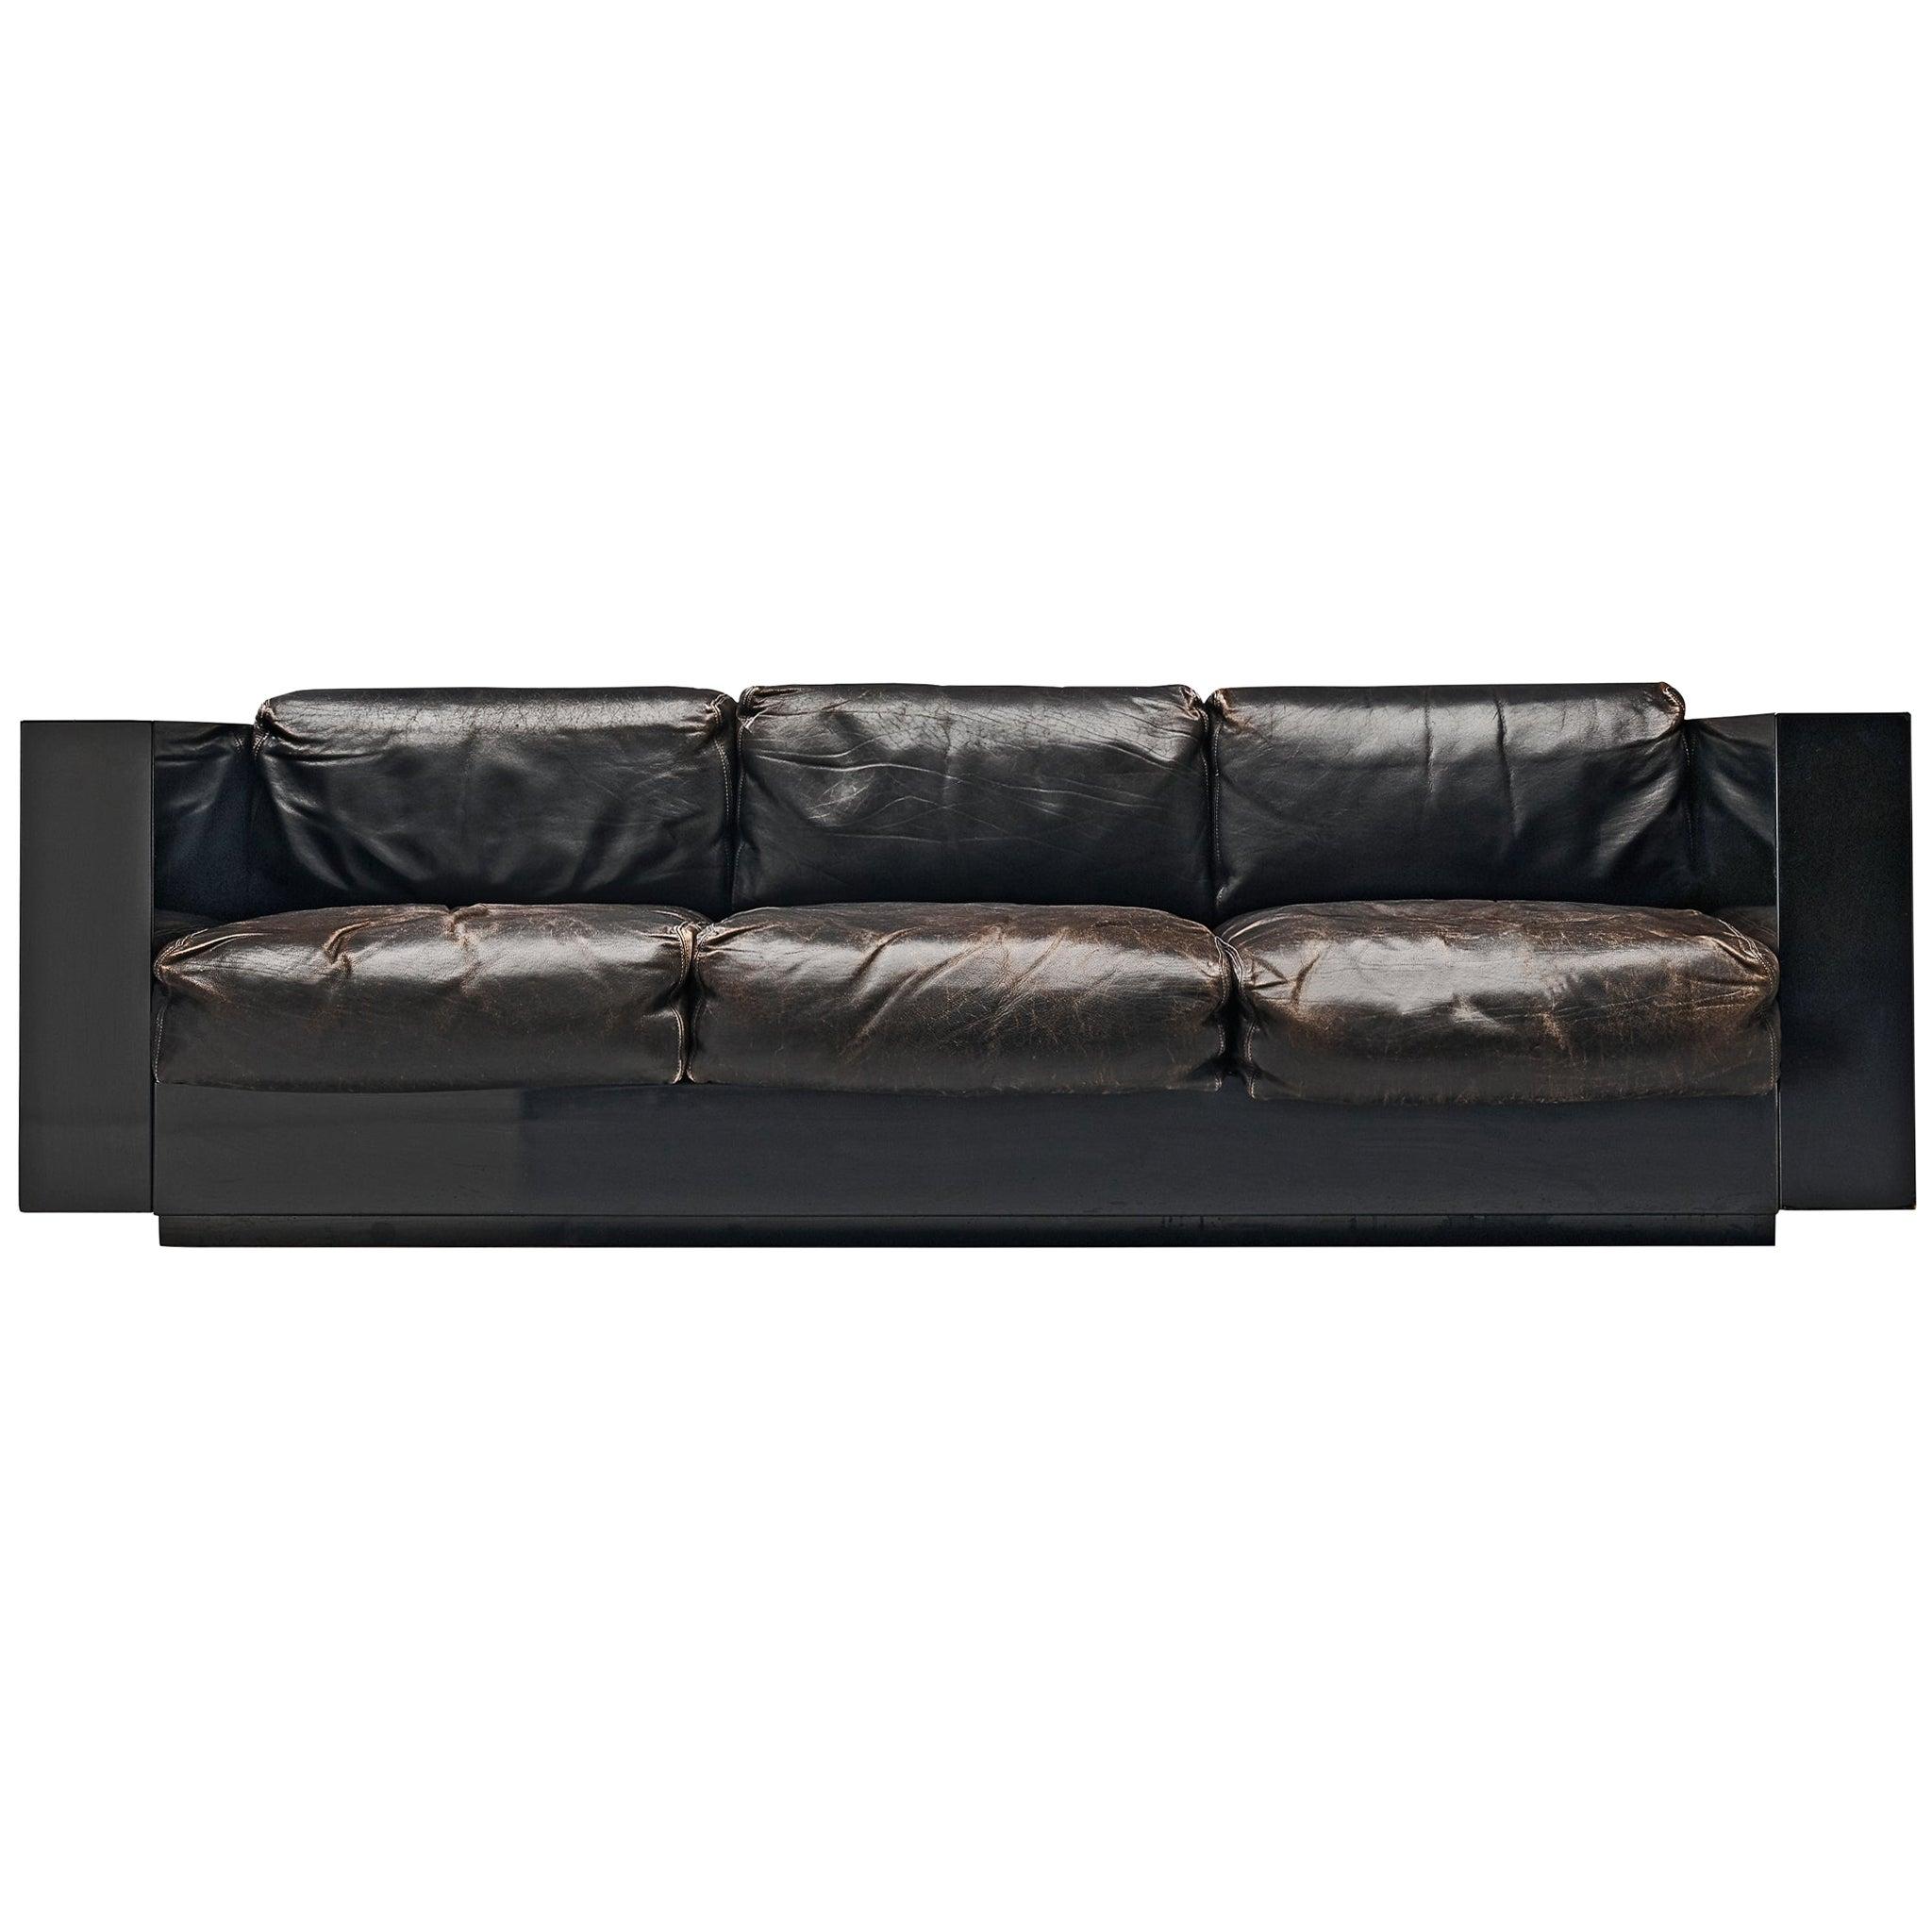 Vignelli Saratoga Large Black Sofa with Black Leather